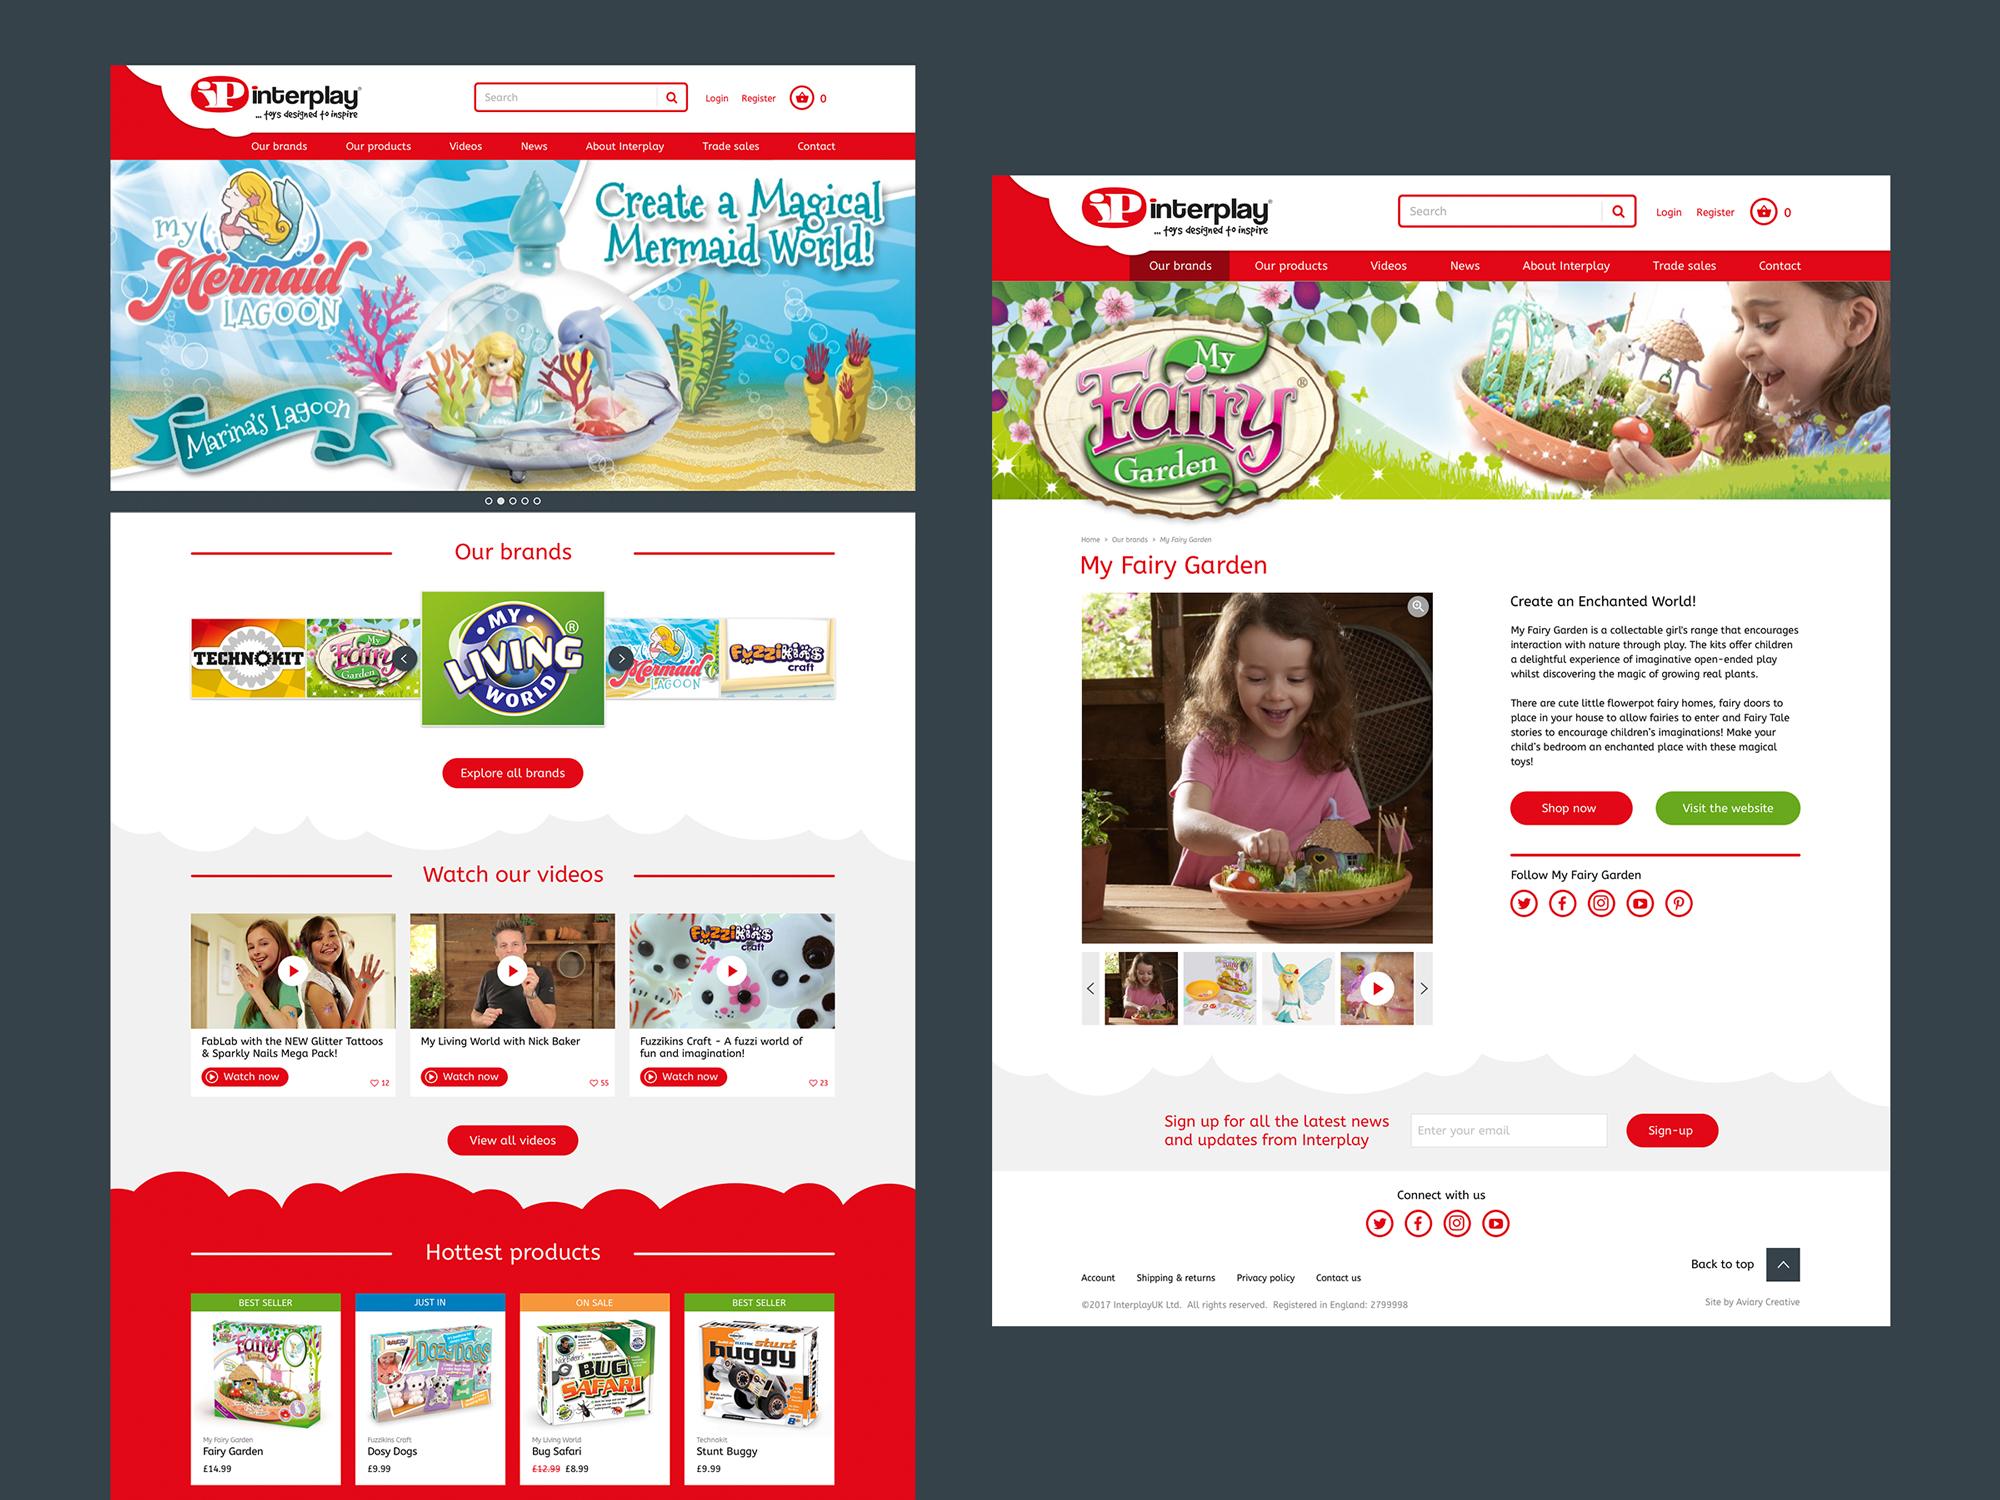 Interplay homepage